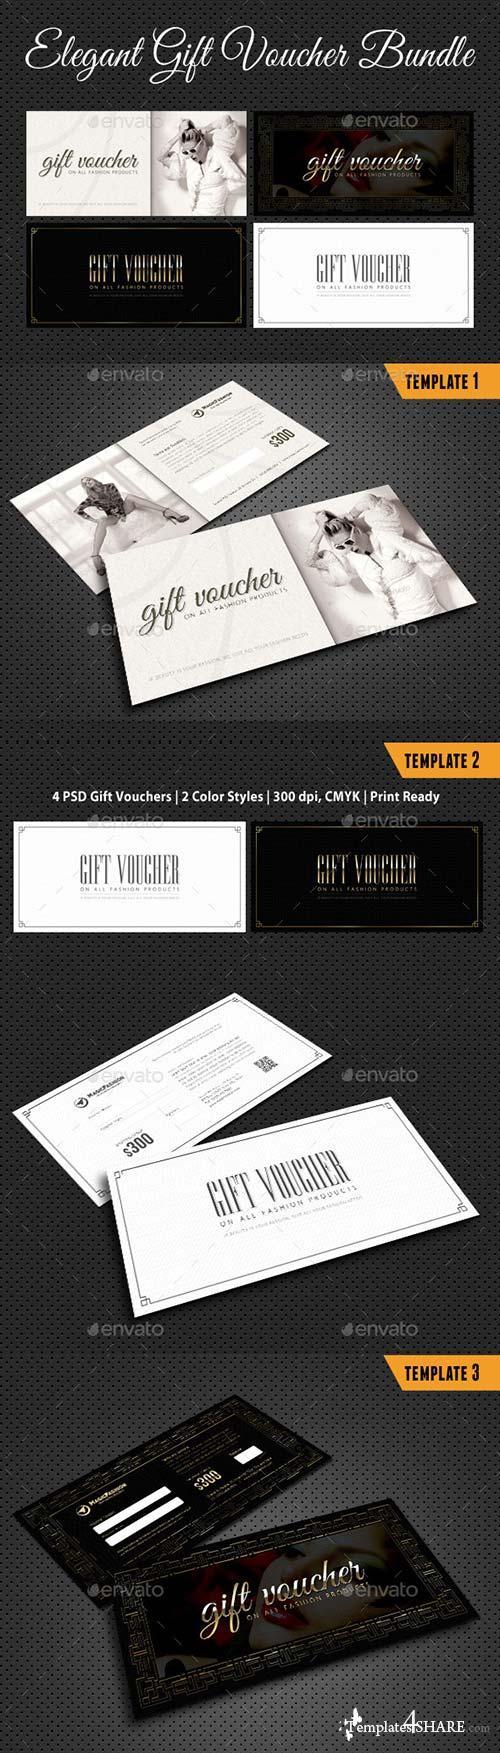 GraphicRiver 3 in 1 Elegant Gift Voucher Bundle 01